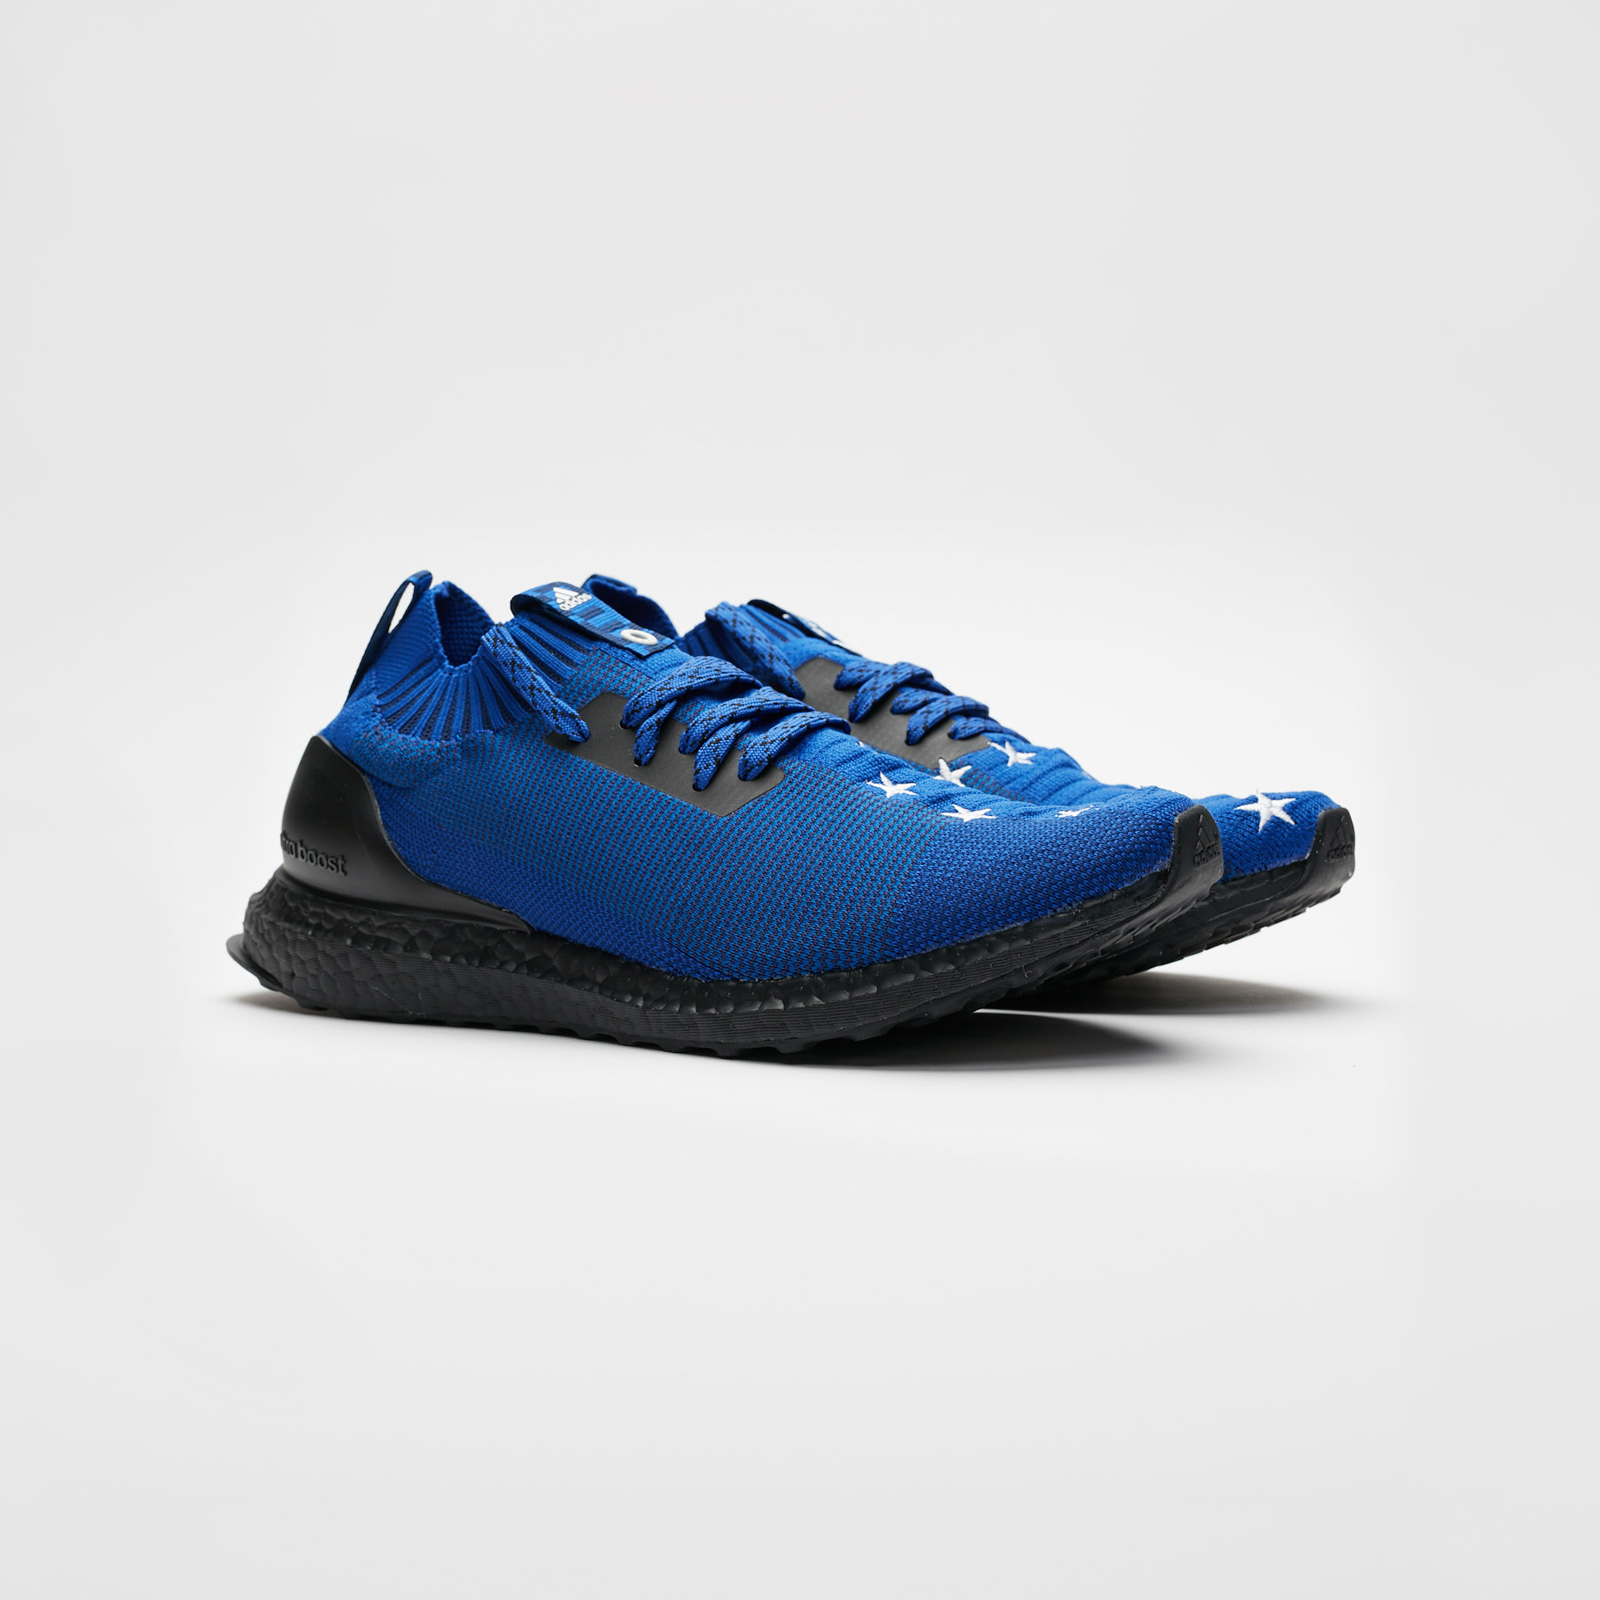 6420531dd adidas UltraBOOST x Études - D97732 - Sneakersnstuff